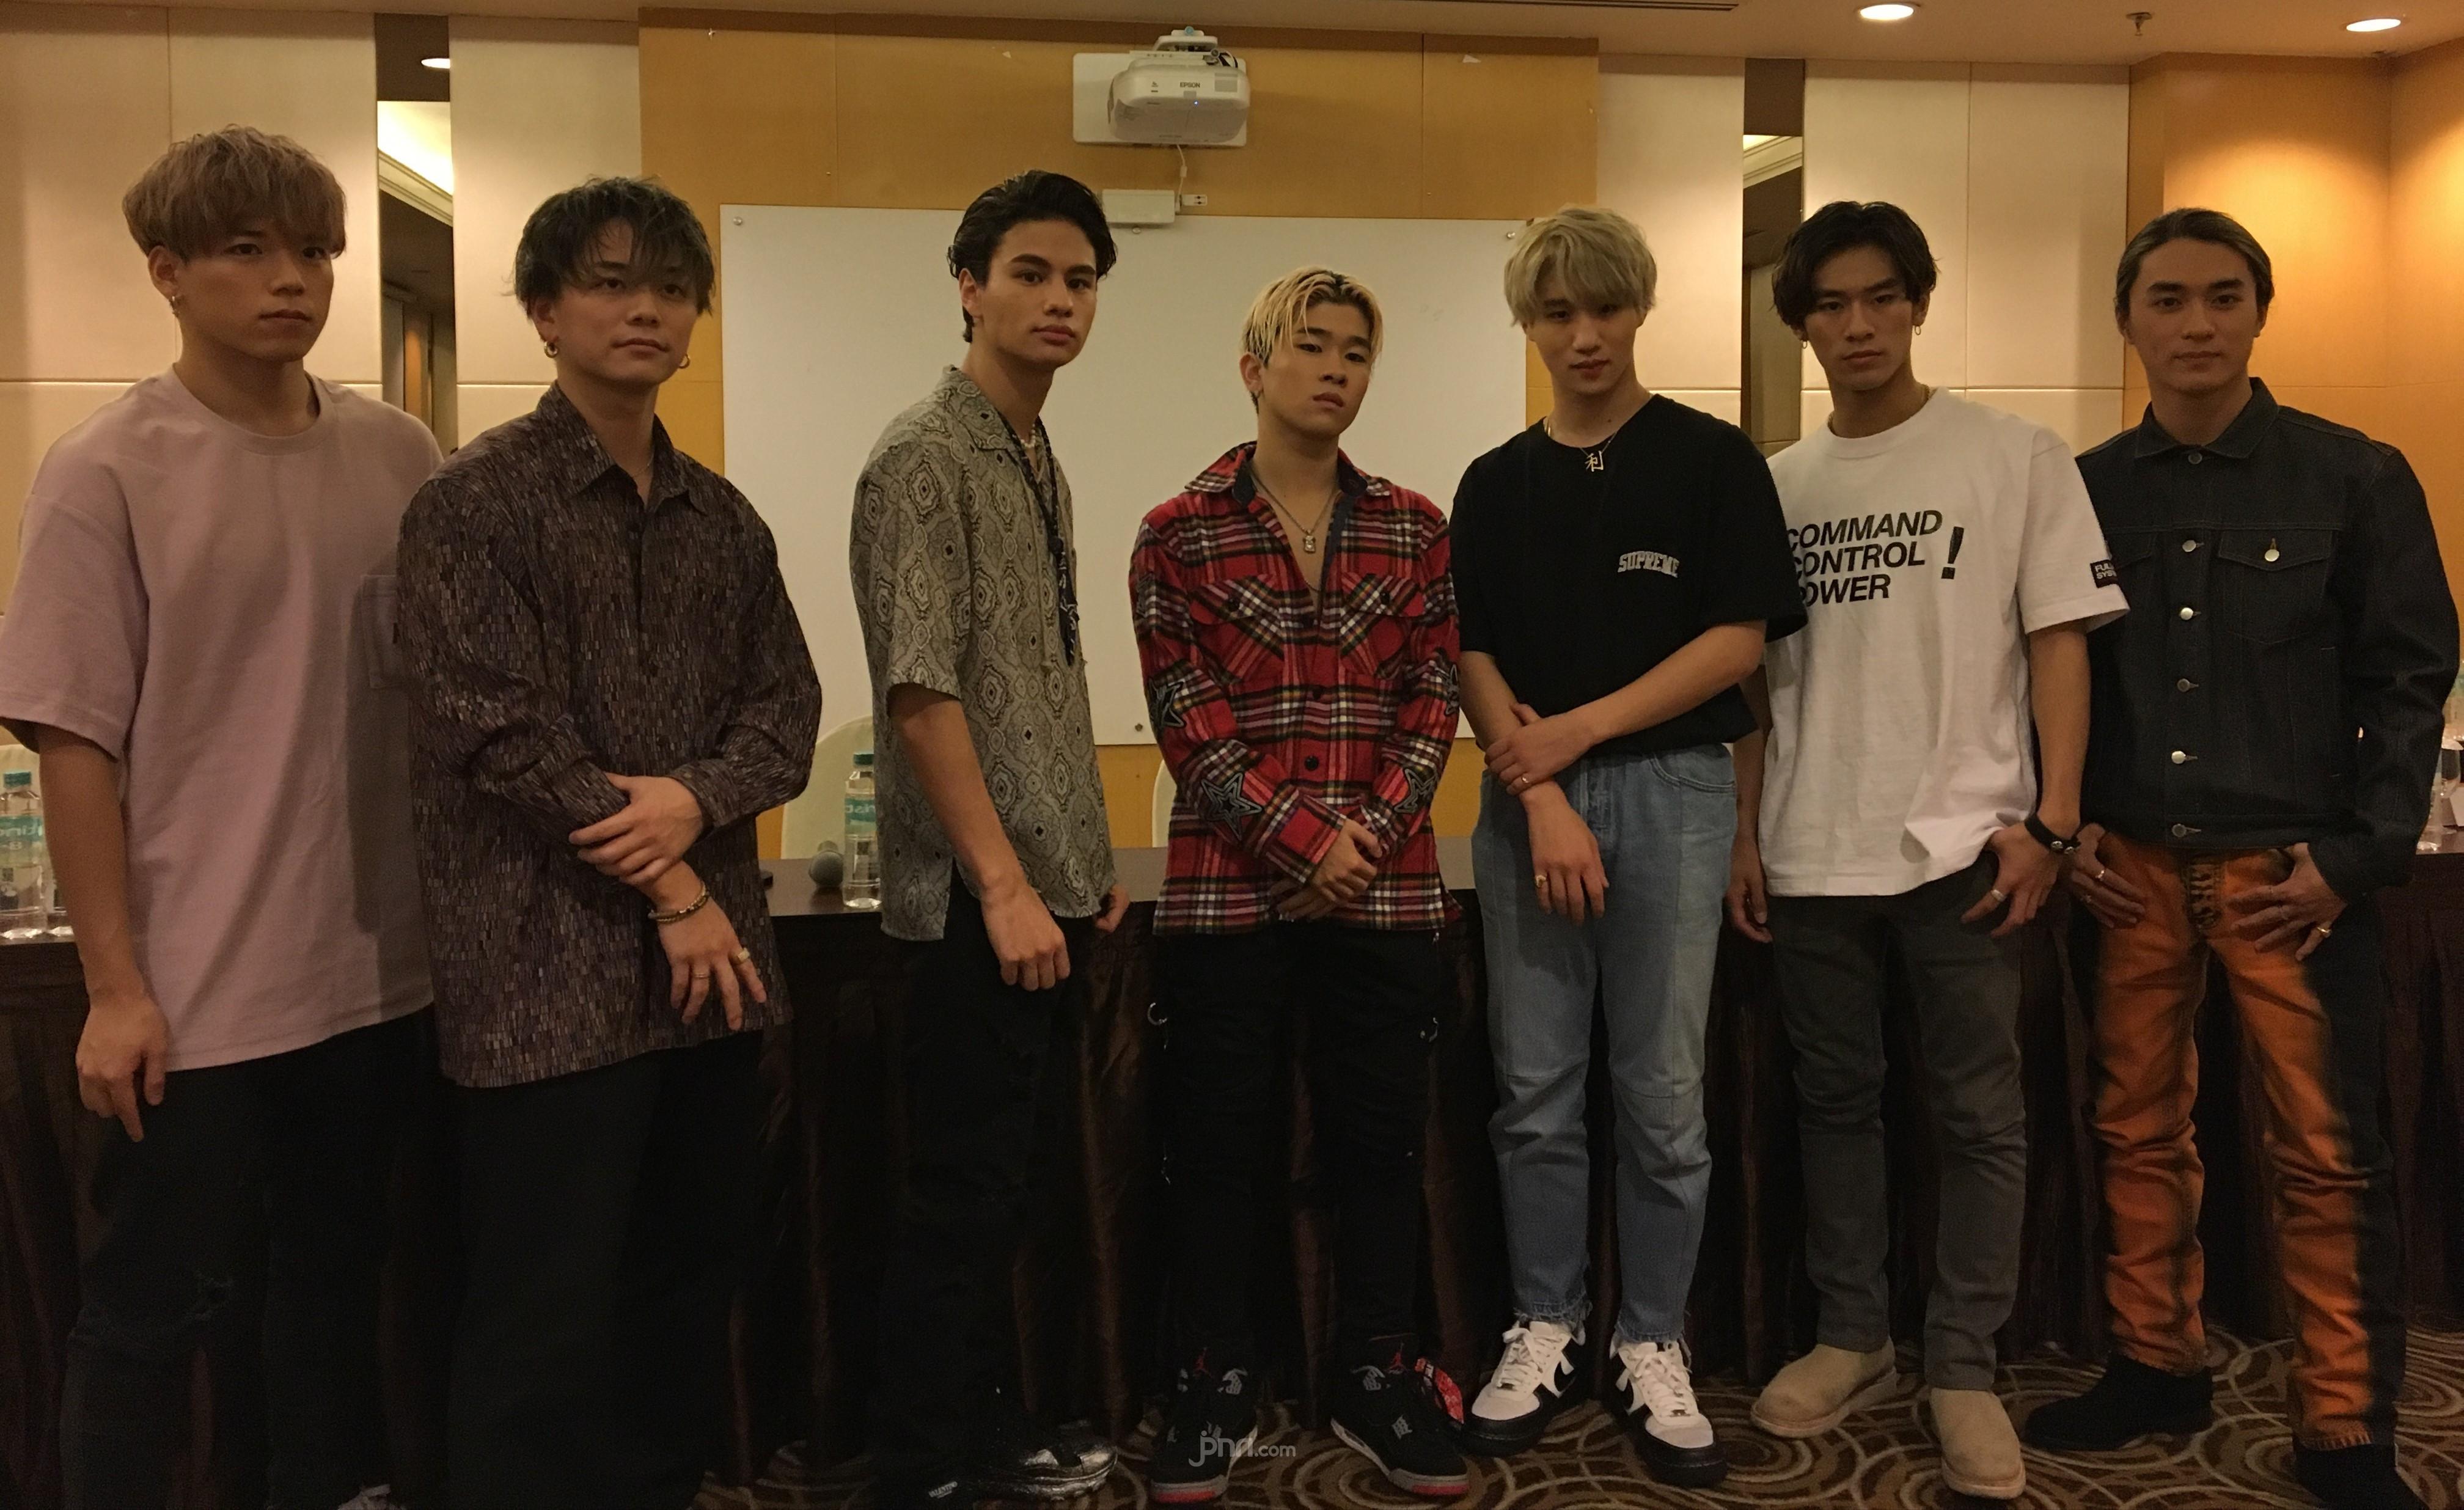 Konser di Indonesia, Ballistik Boyz Sempatkan Wisata Kuliner - JPNN.com